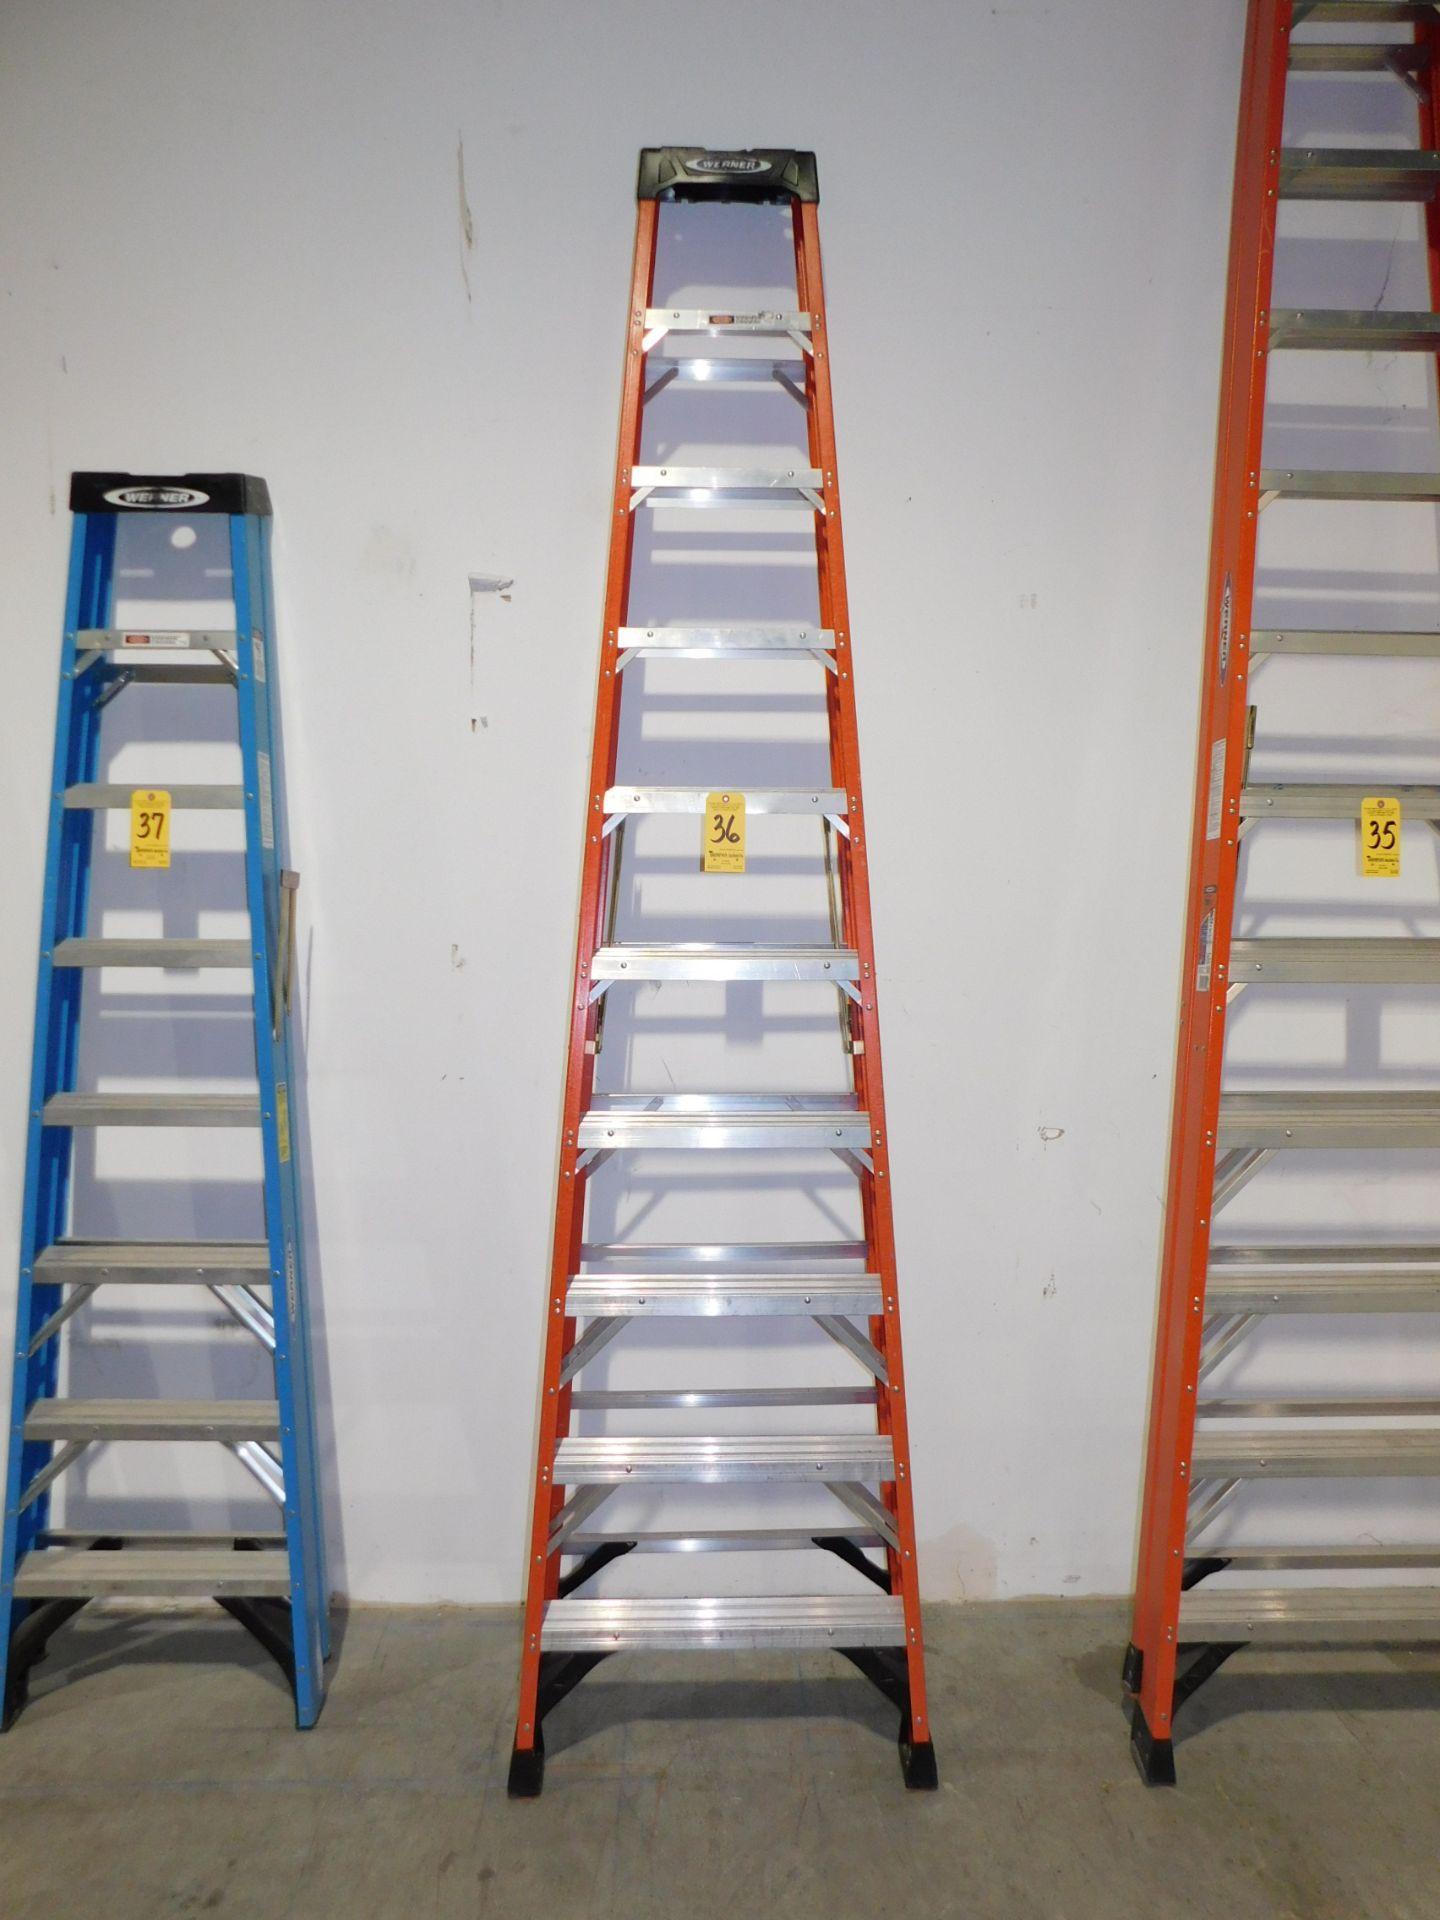 Lot 36 - Werner 10' Fiberglass Step Ladder